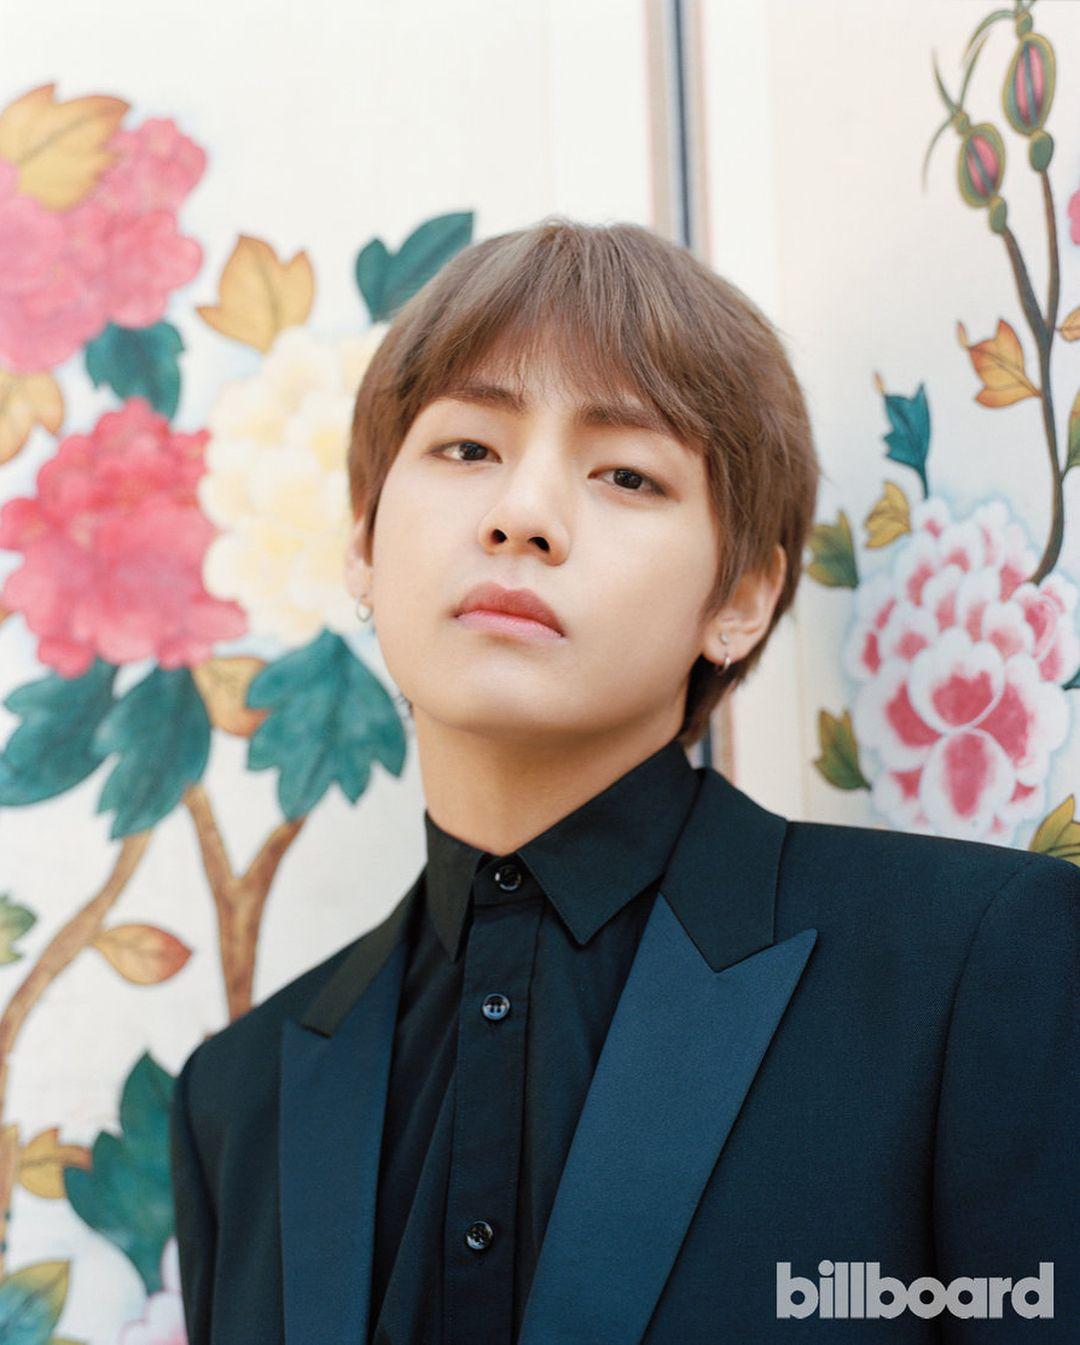 Pin By Asian World Kdramaplanet On Bts Bts Billboard Taehyung Kim Taehyung